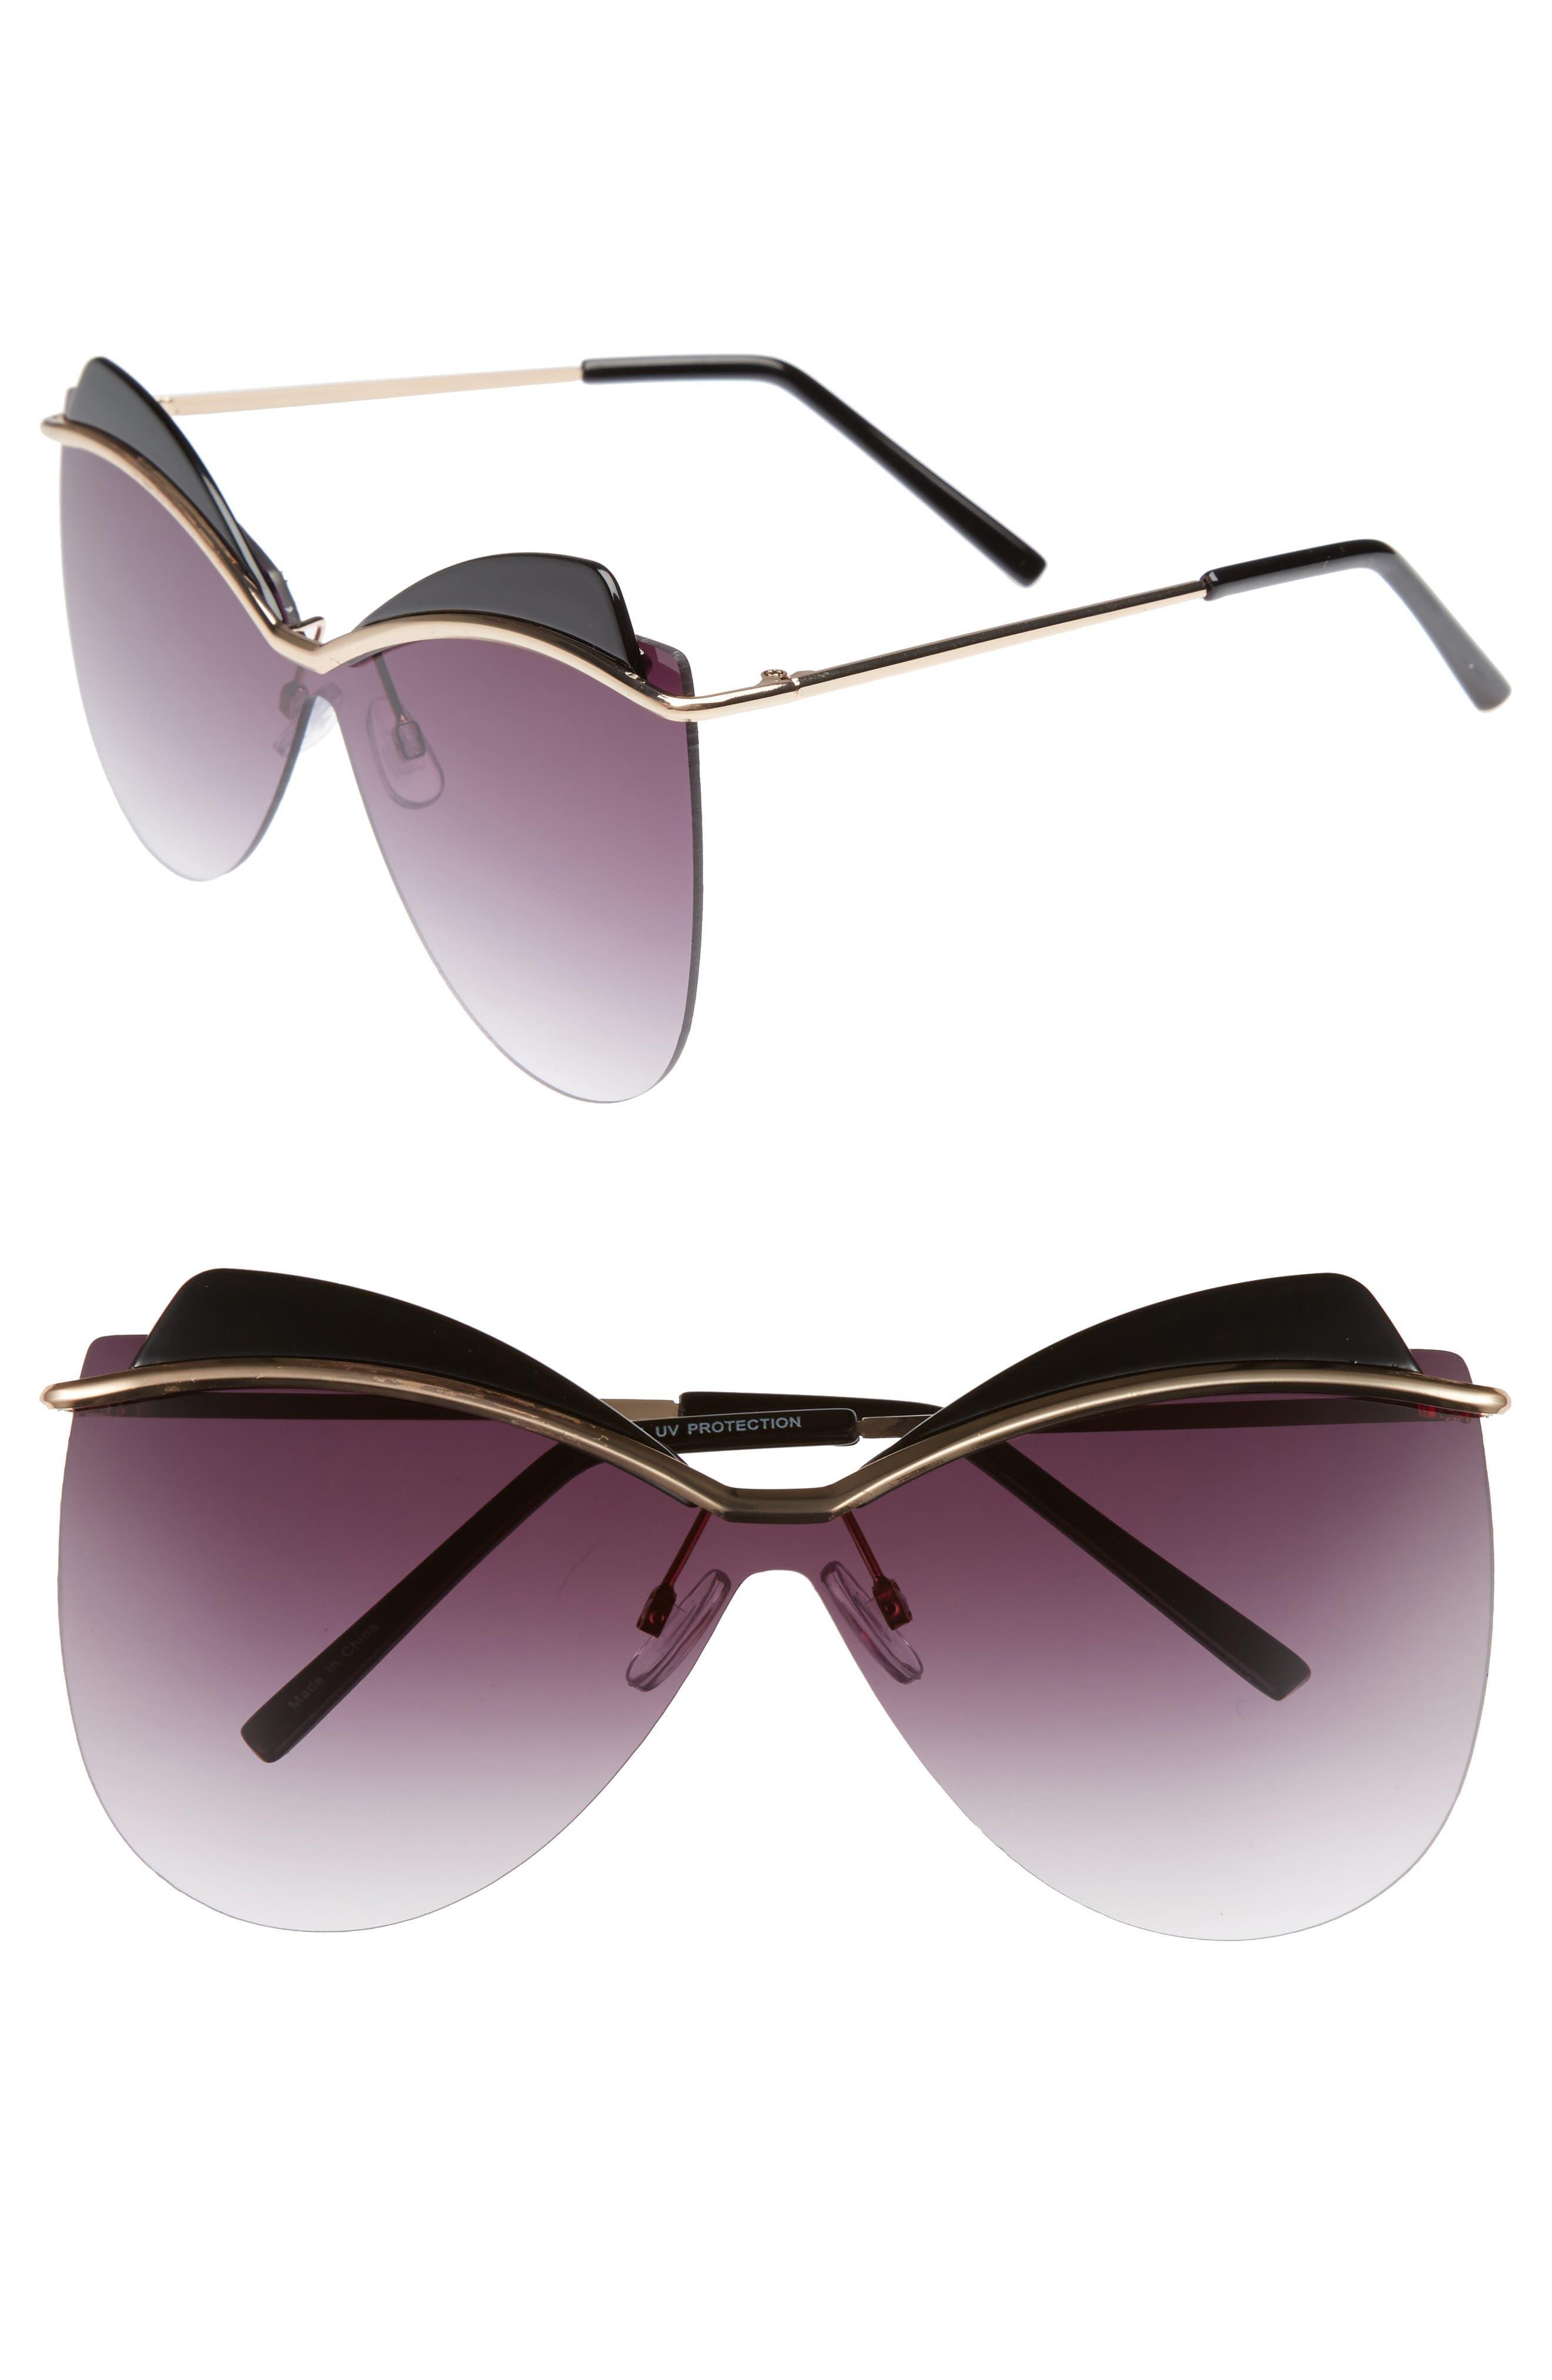 Main Image - BP. 65mm Rimless Shield Sunglasses